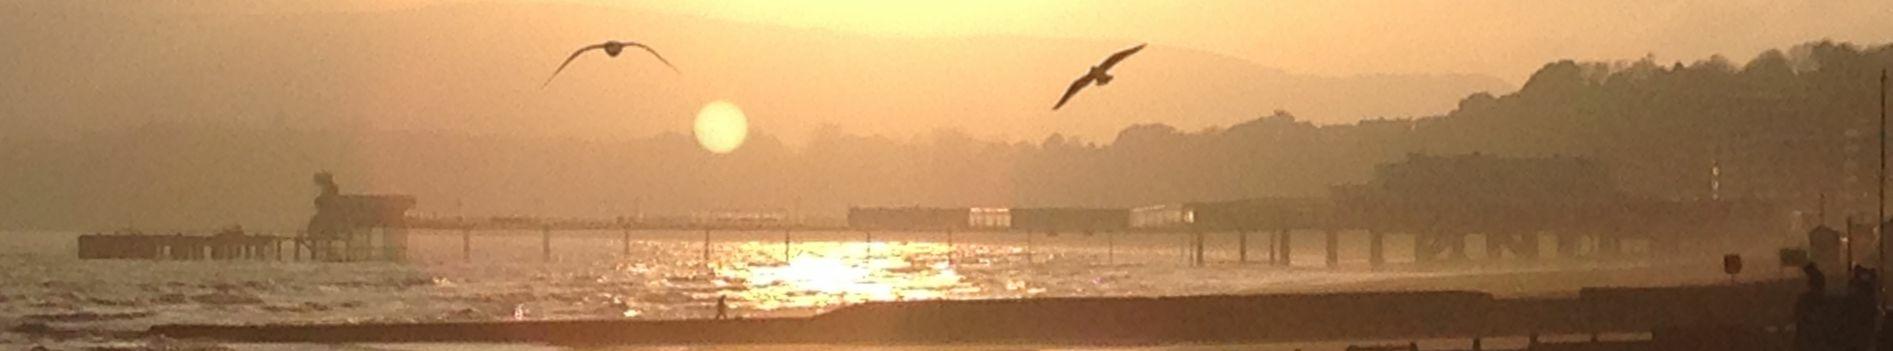 IoW sunset pier